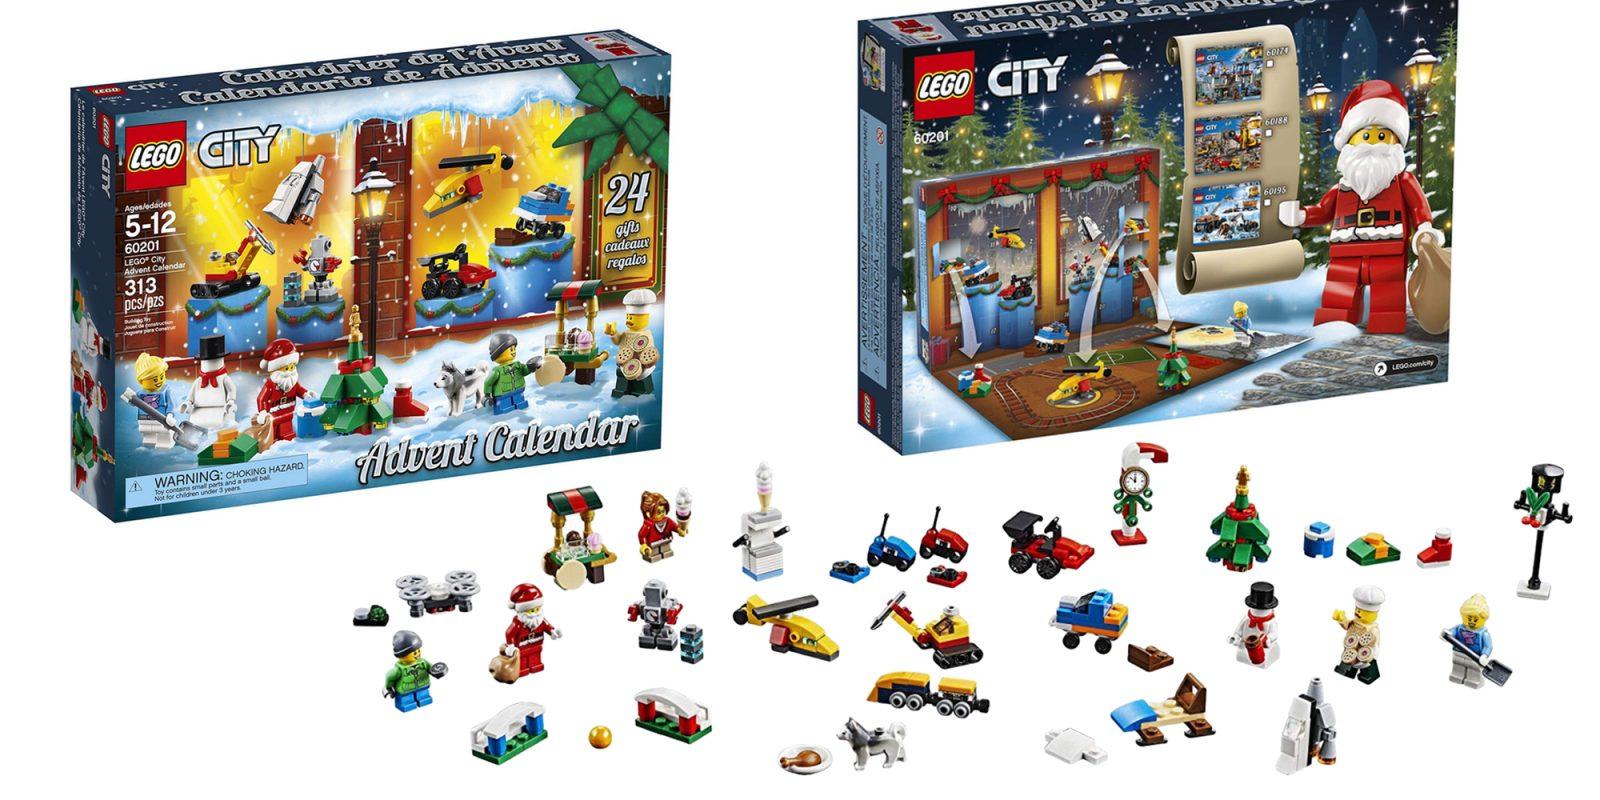 Lego S City Advent Calendar Packs 24 Miniature Builds At 22 Reg